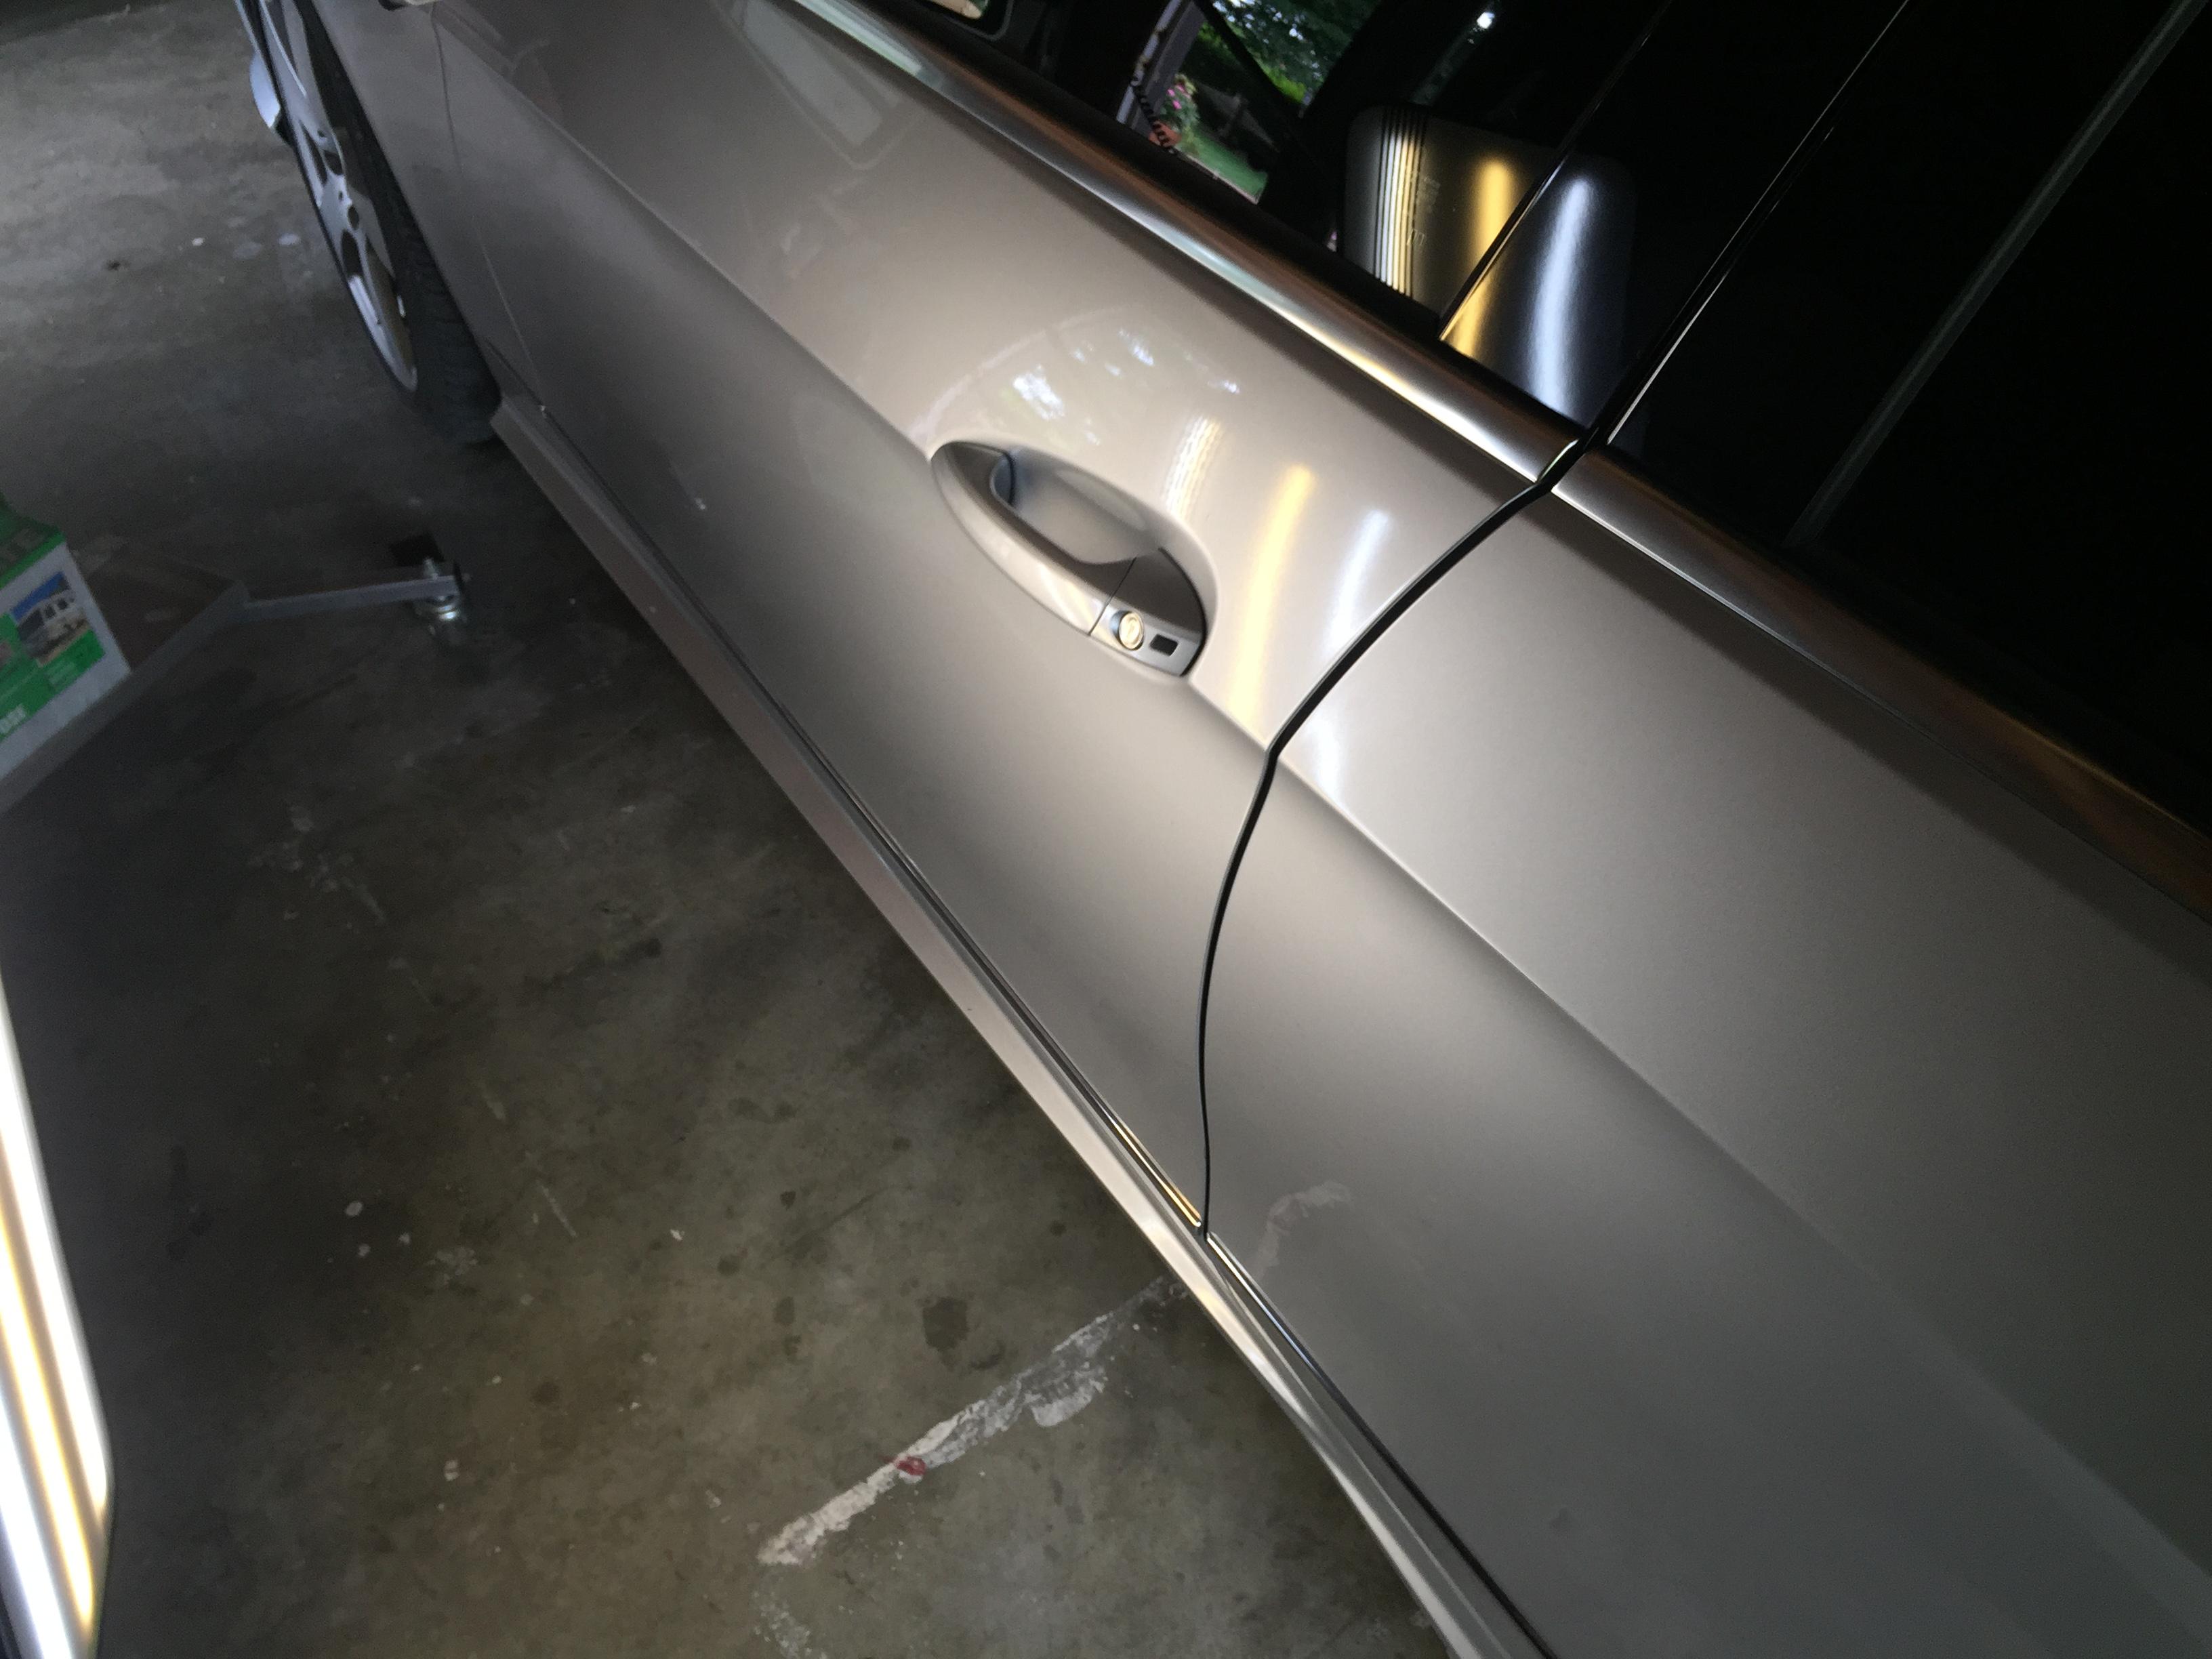 2010 Mercedes E350 Dent Repair, Springfield, IL. Http://217Dent.com Integirty Industries